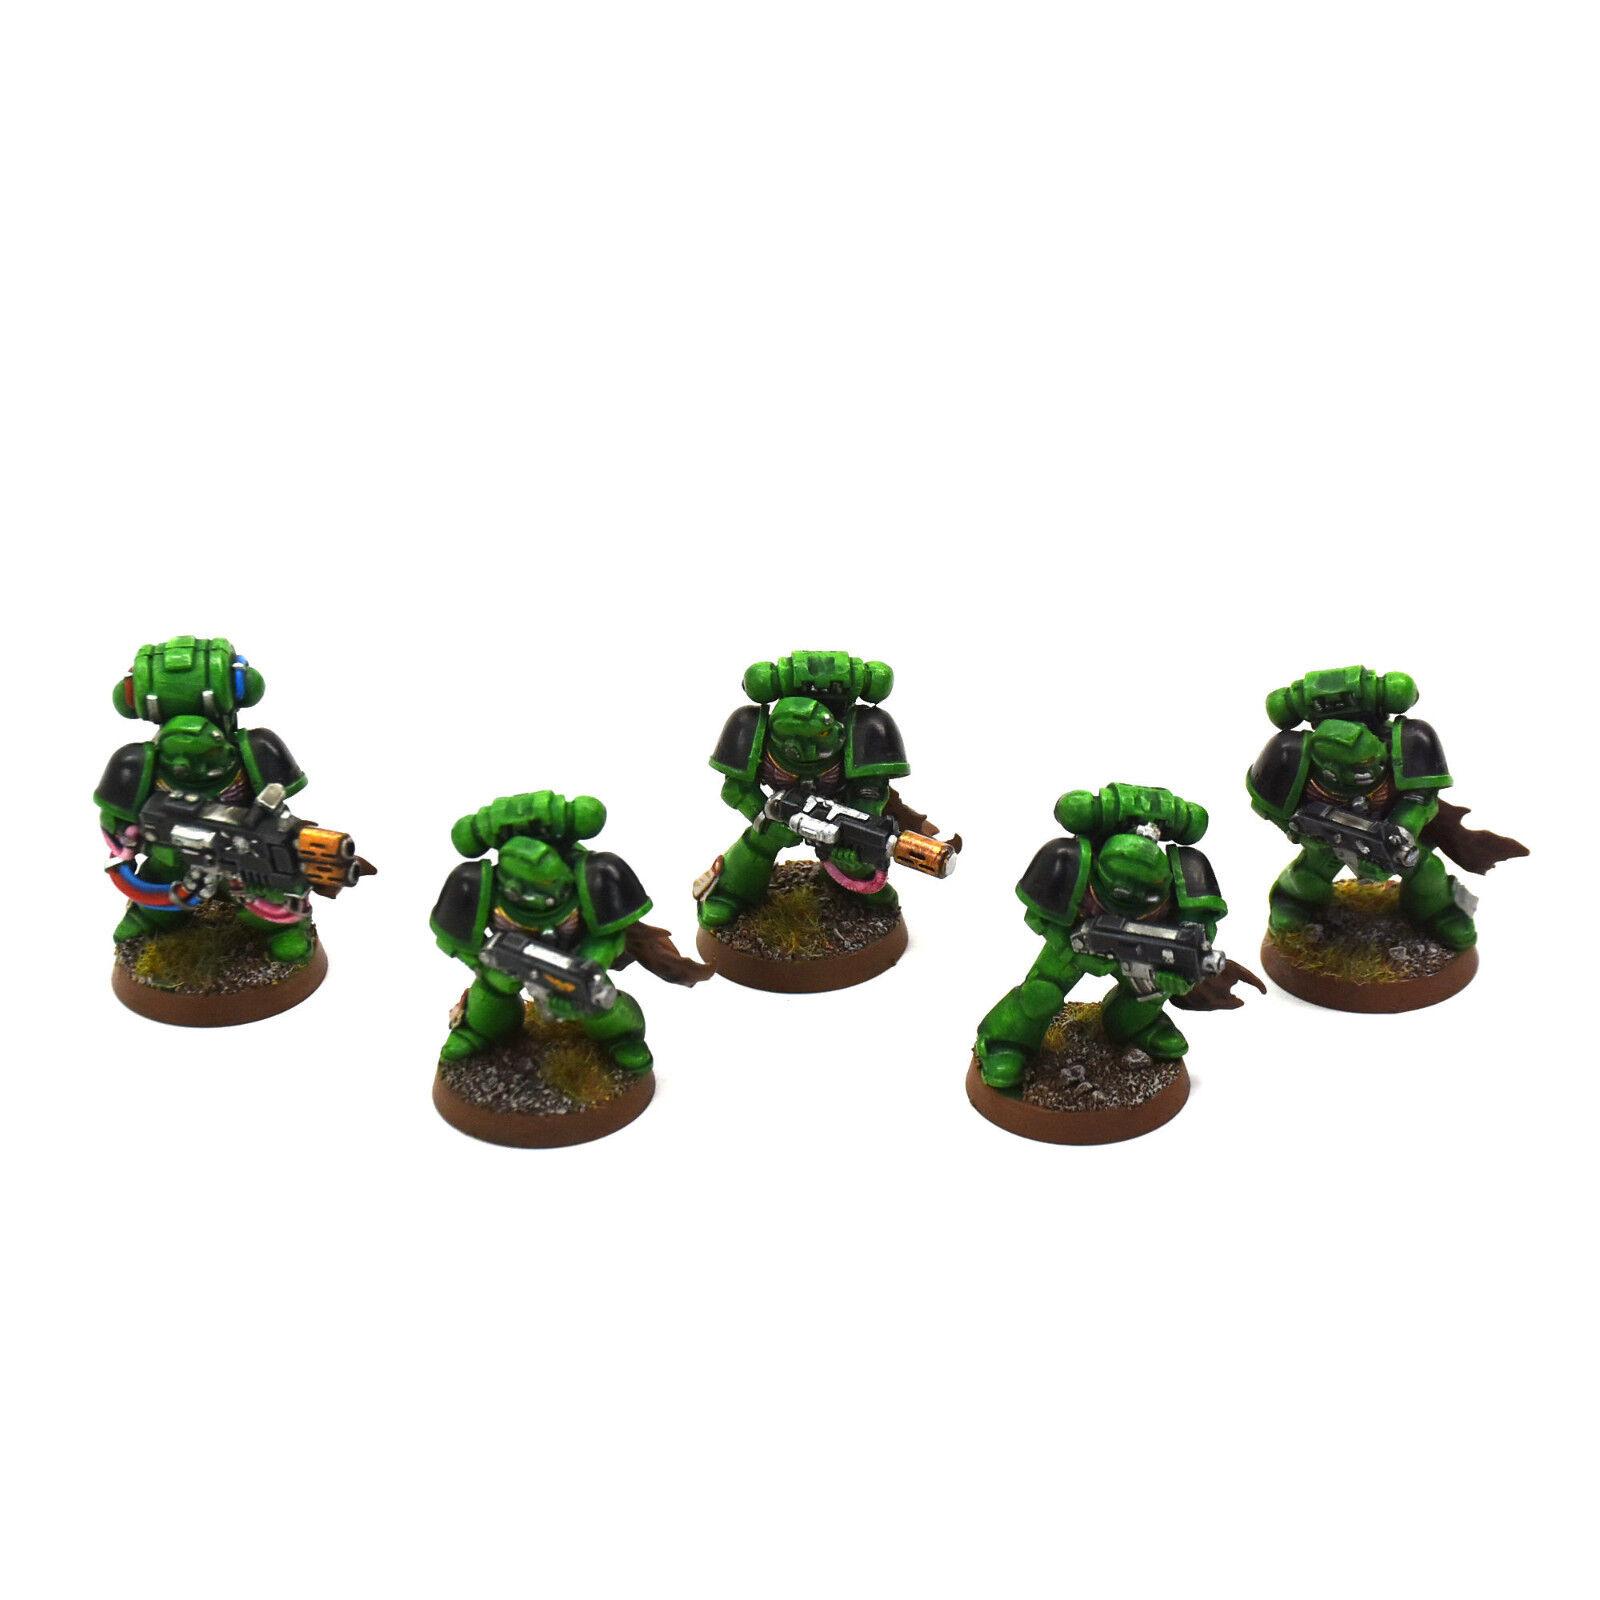 SPANS MARINES 5 taktiska marinsoldater Kongrönerade Salamanders PRO PAINTED Squad 40K